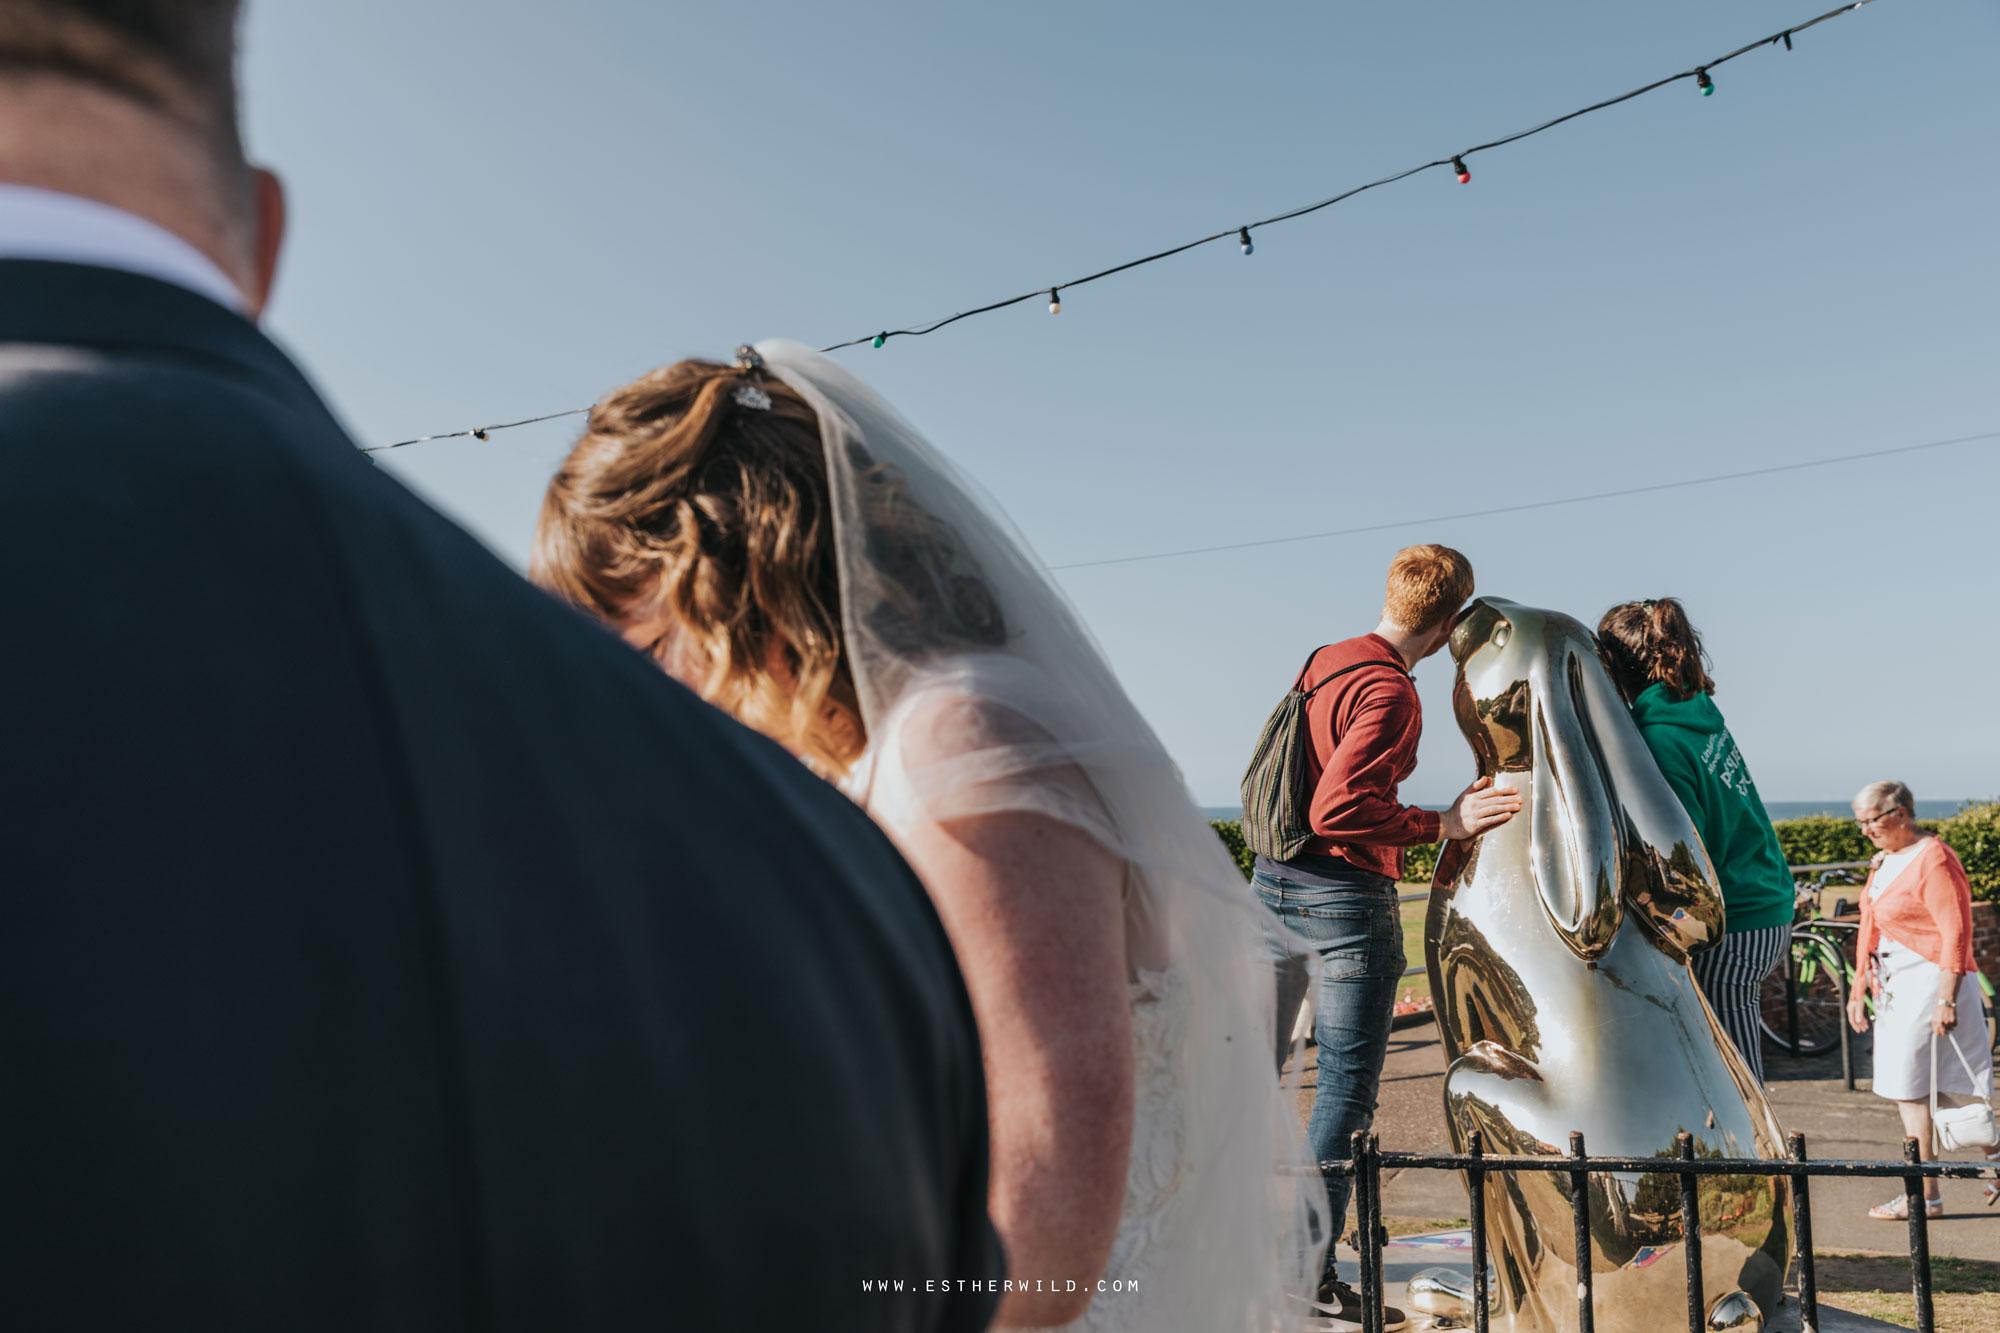 Cromer_Wedding_Beach_Outdoor_Ceremony_Norfolk_North_Lodge_Registry_Office_Rocket_House_Cafe_Cromer_Pier_IMG_4267.jpg